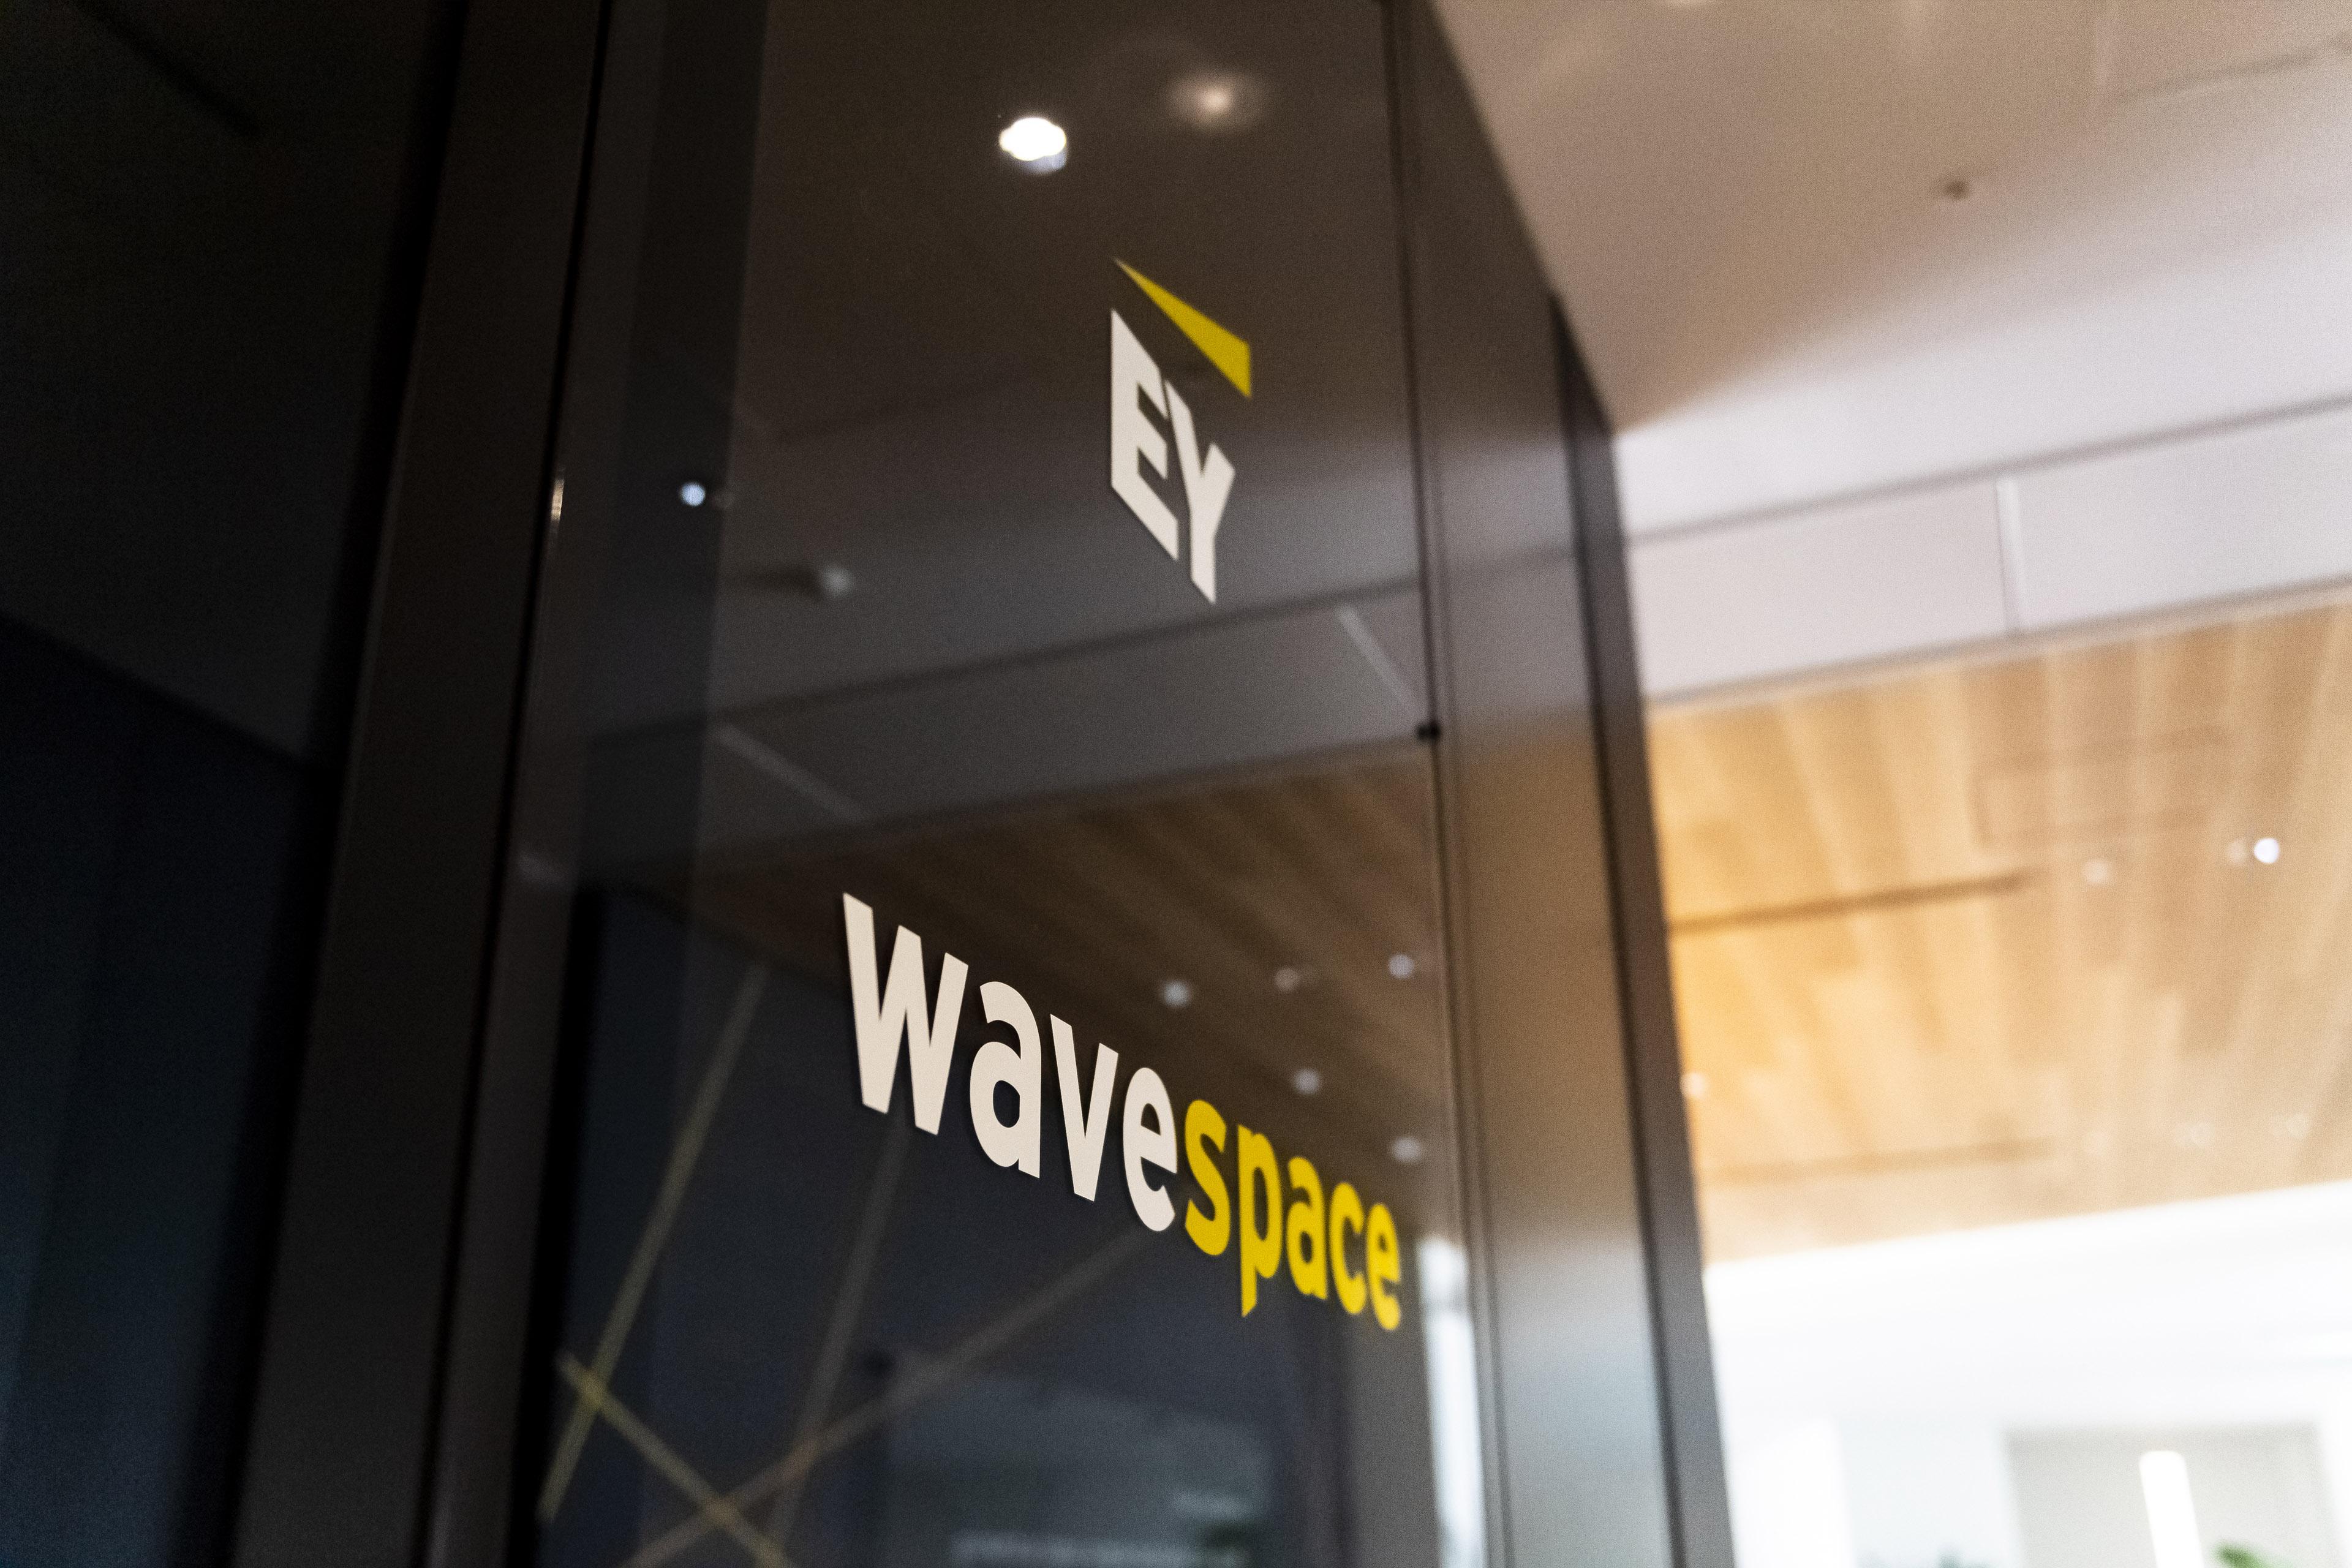 Wavespaceで拡がる可能性とは?